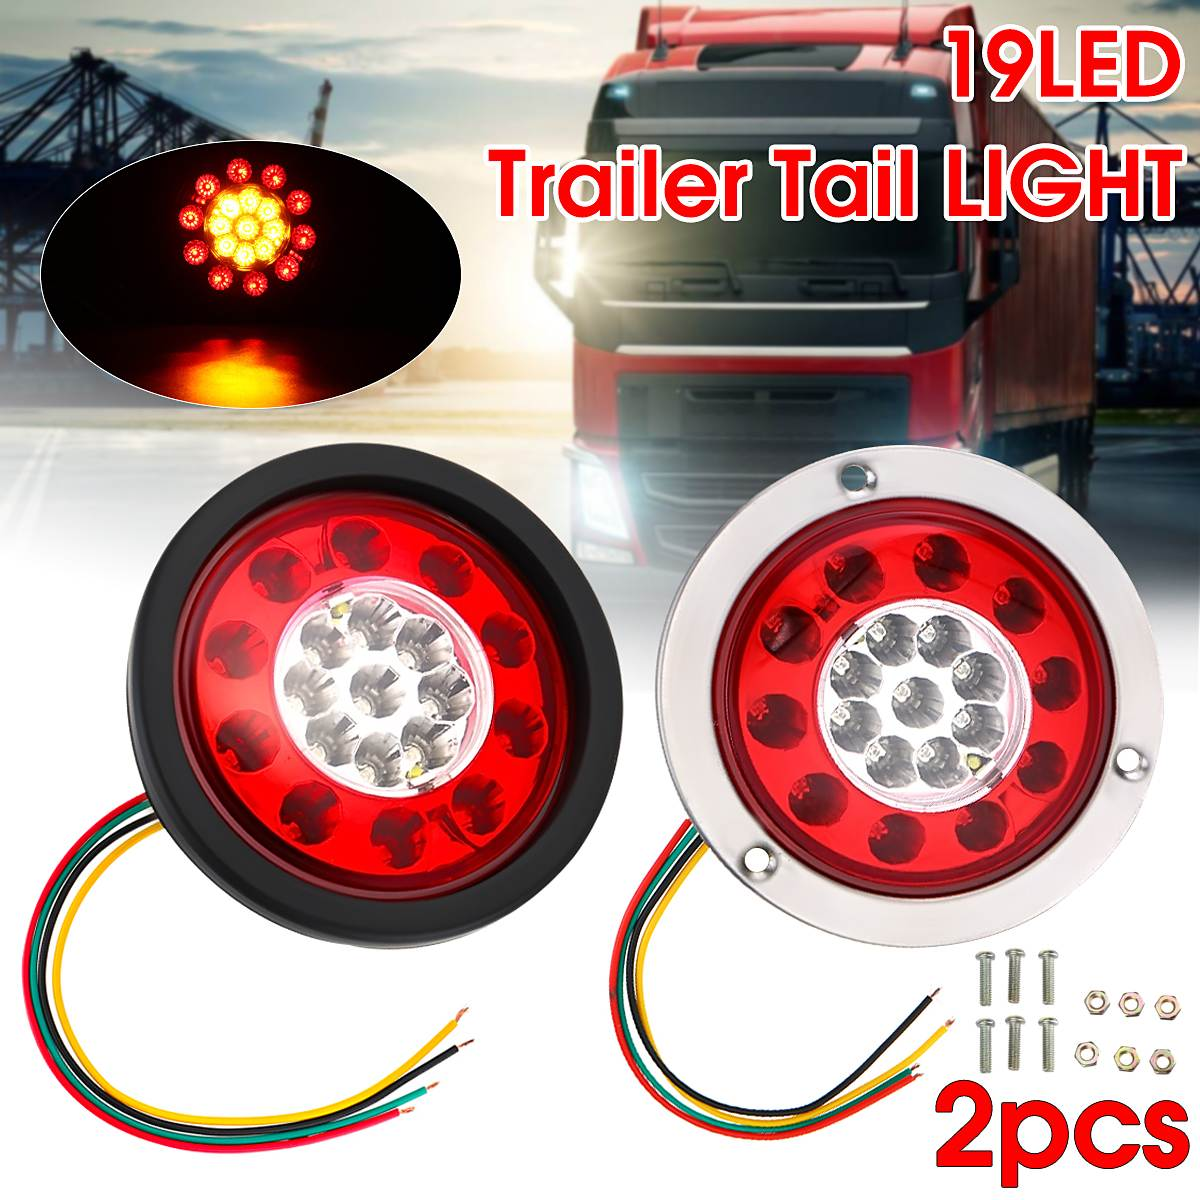 Round 19 LED Truck Trailer Lorry Brake Stop Turn Tail Light Black Rubber Ring yamaha led trailer light kit